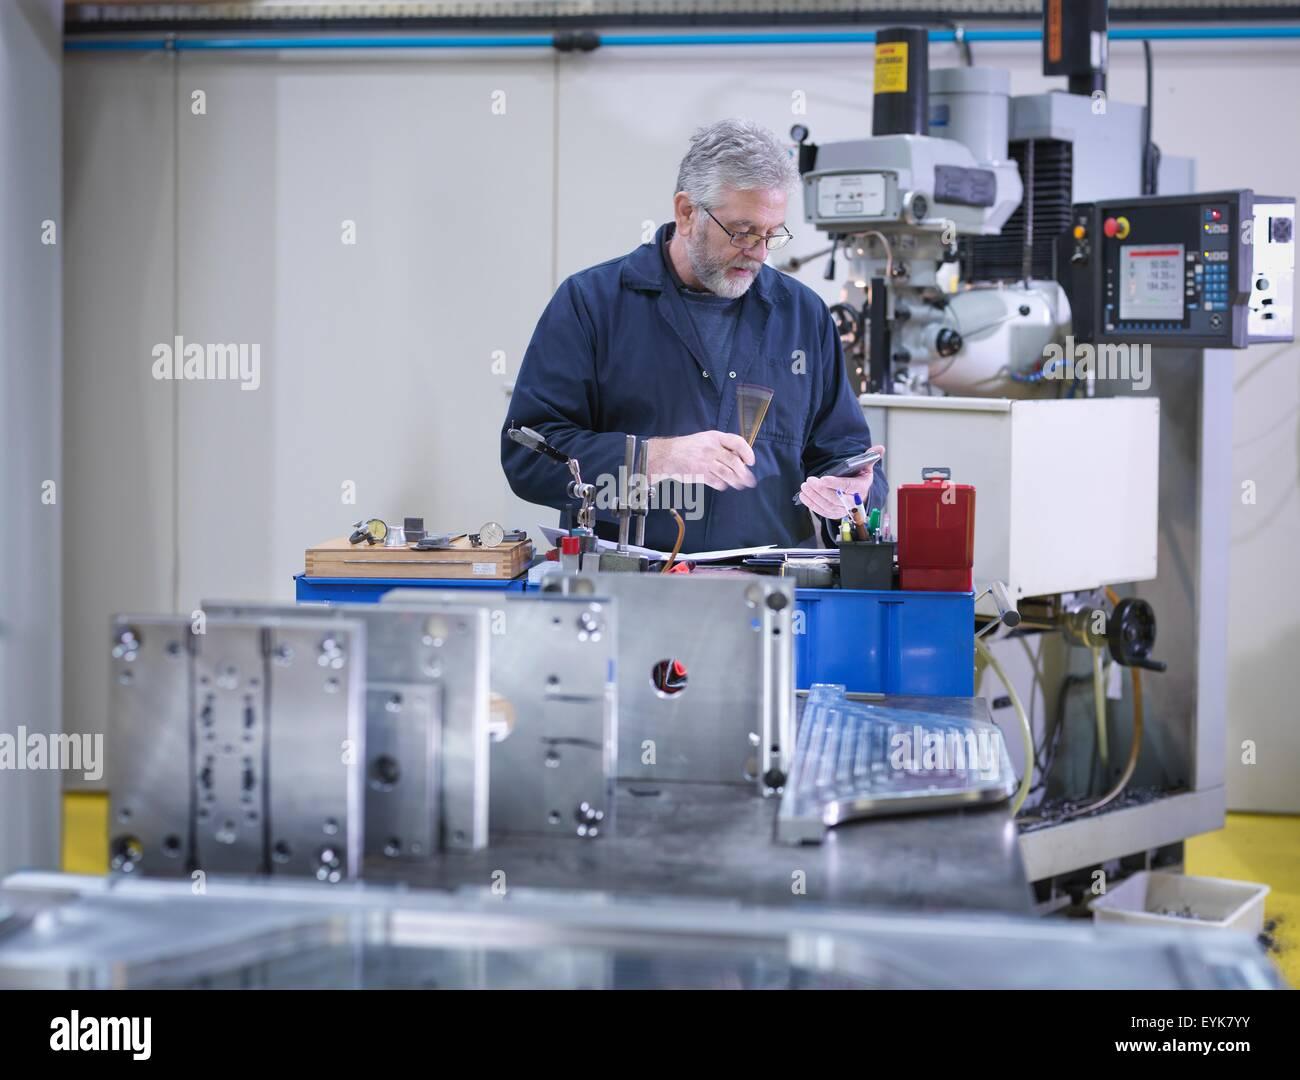 Mature engineer using lathe in engineering factor - Stock Image